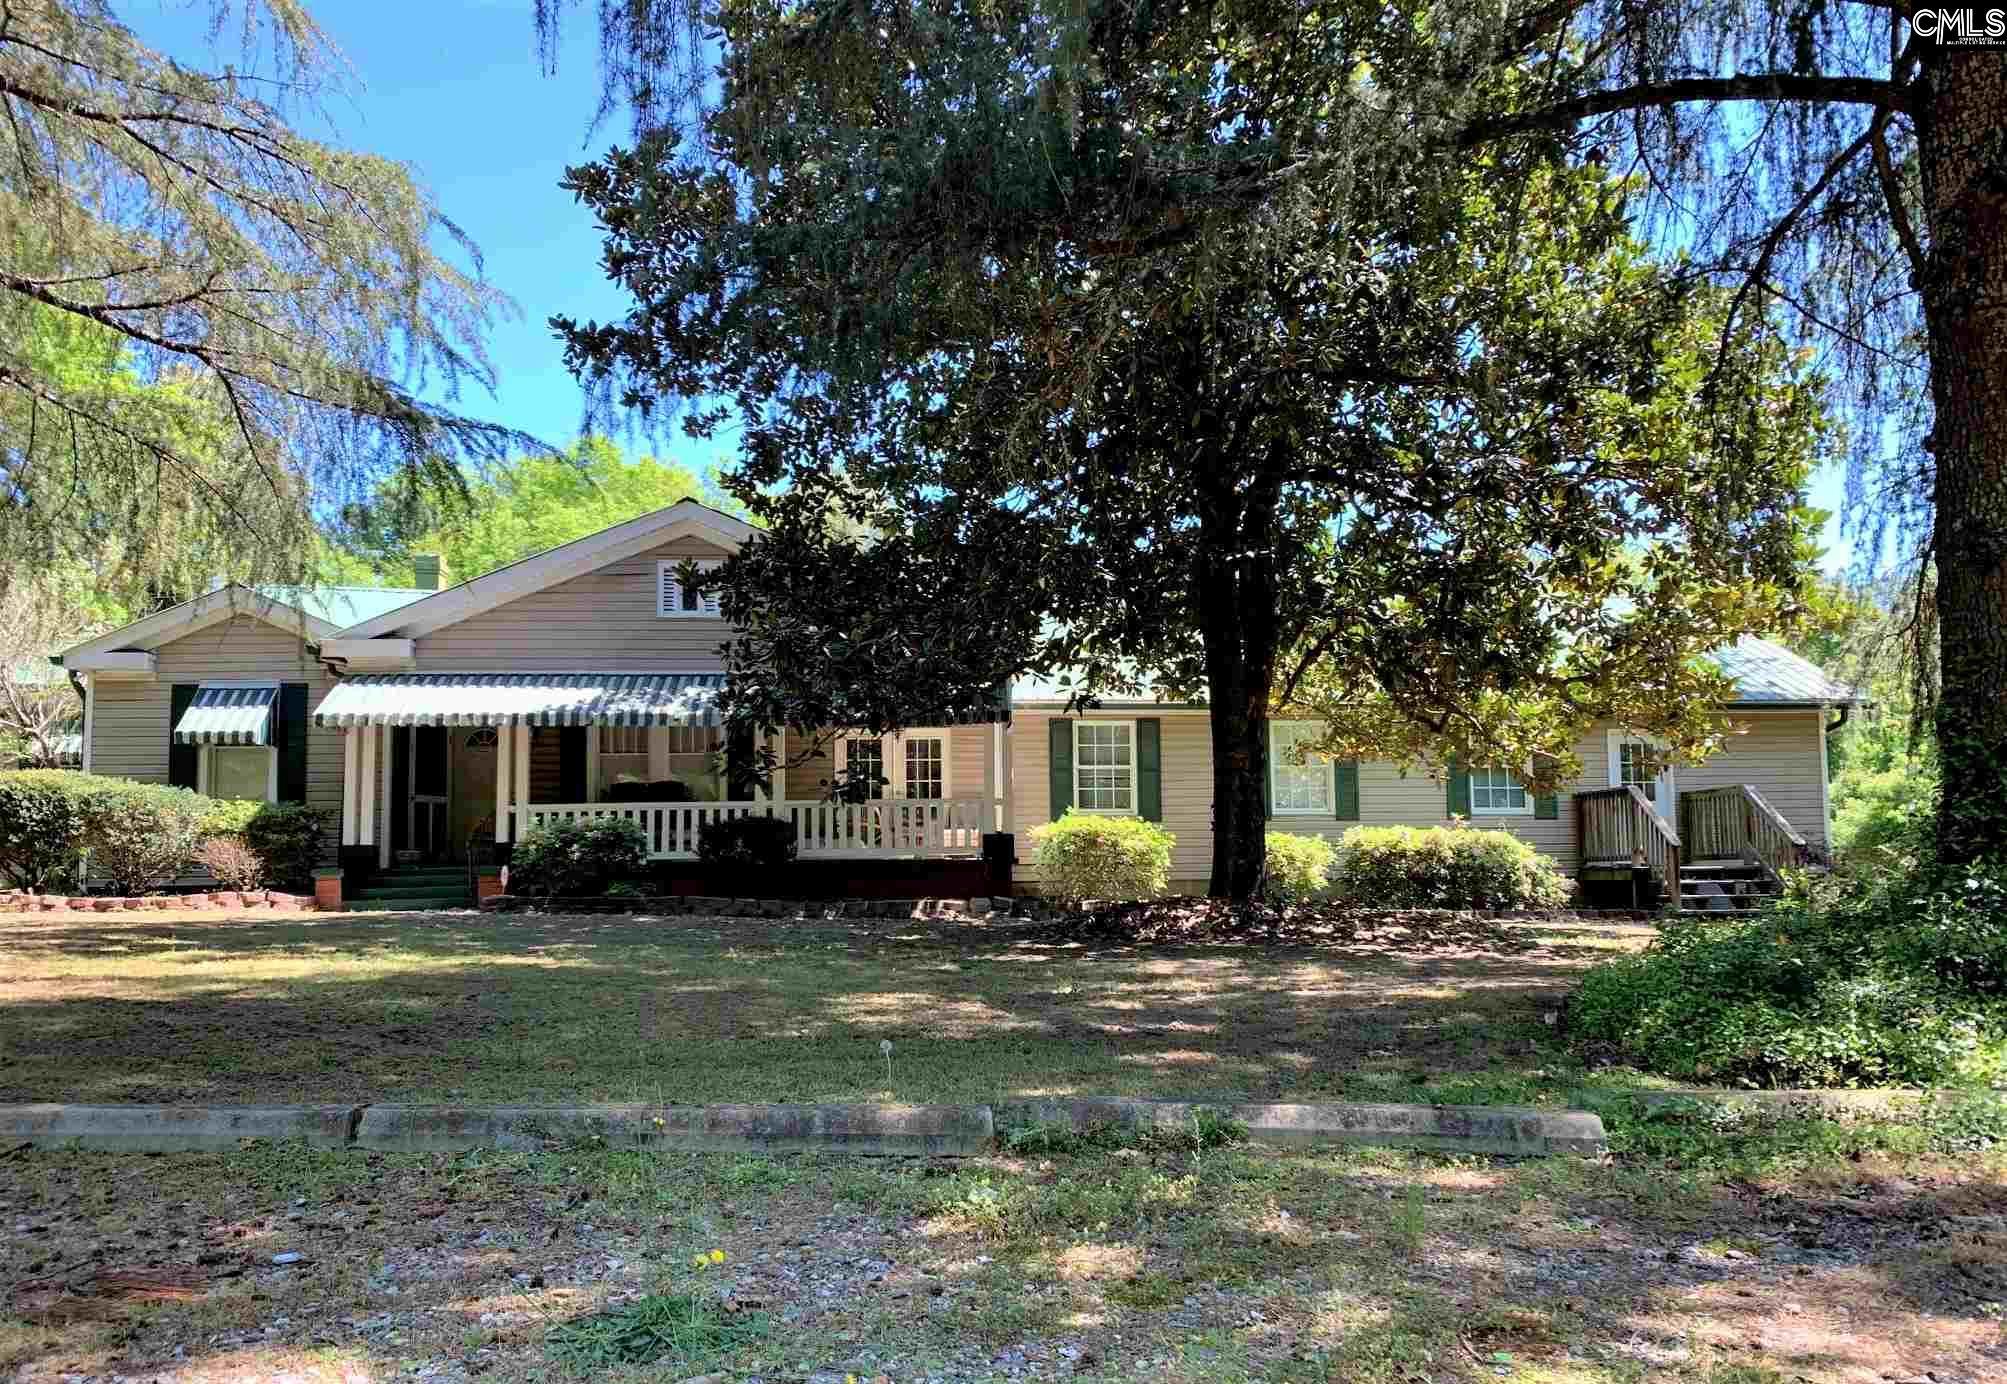 7118 Monticello Columbia, SC 29203-1606